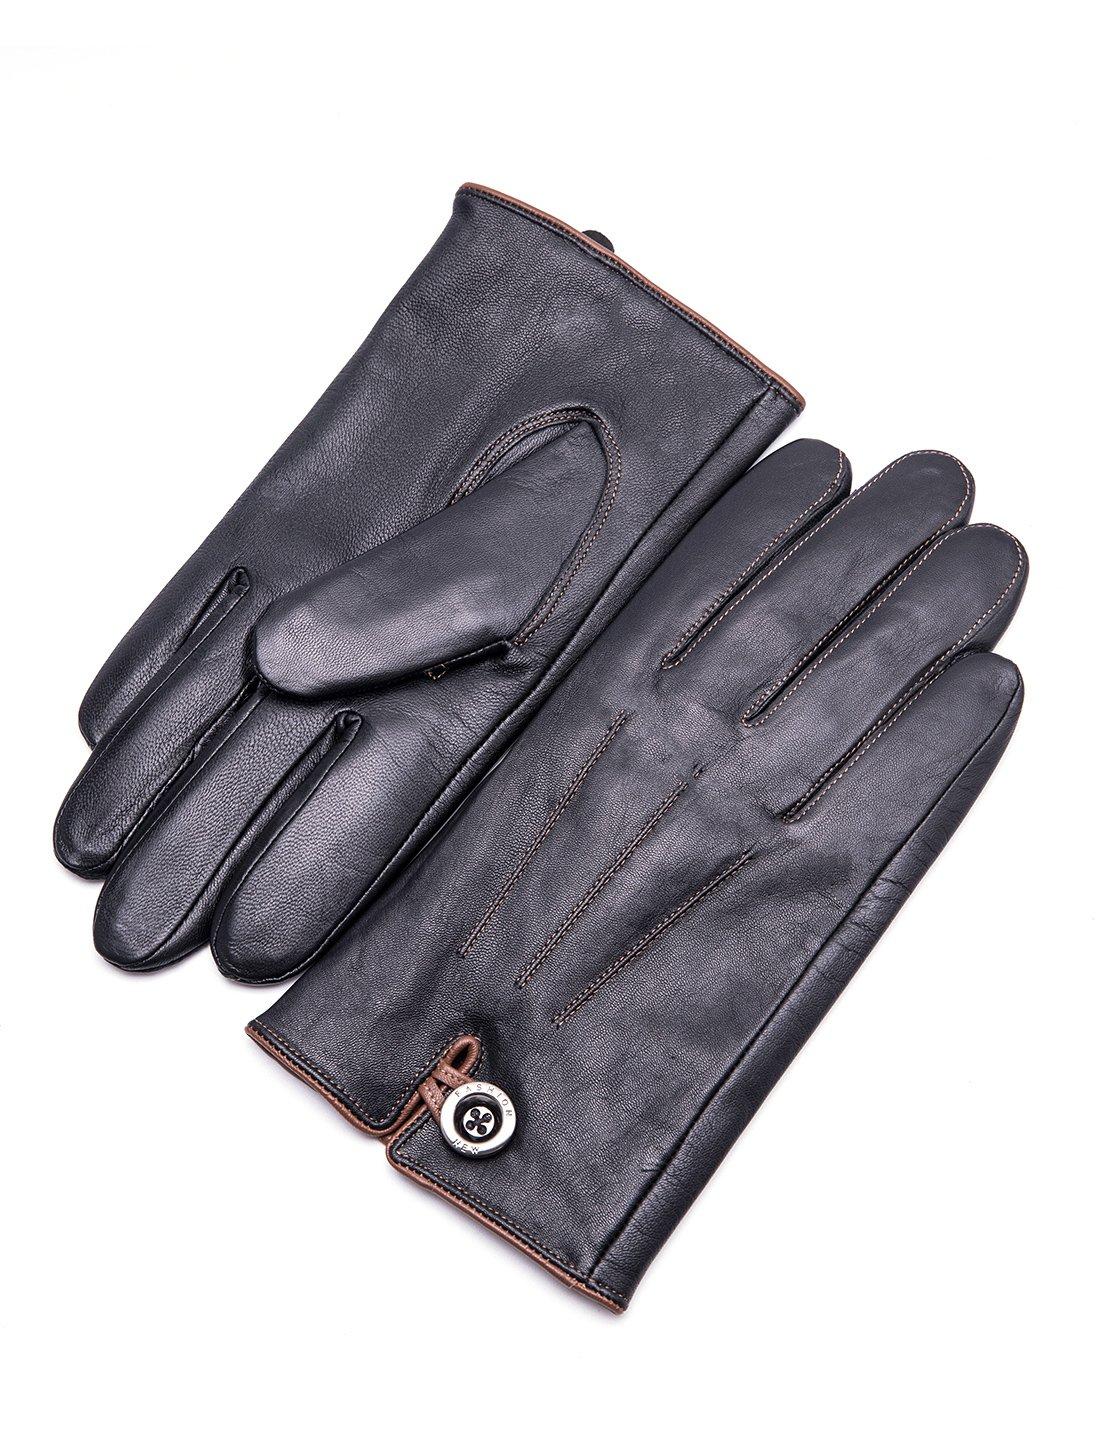 YISEVEN Men's Genuine Goat Skin Leather Winter Warm Lined Gloves /Touchscreen,Black,9.5''